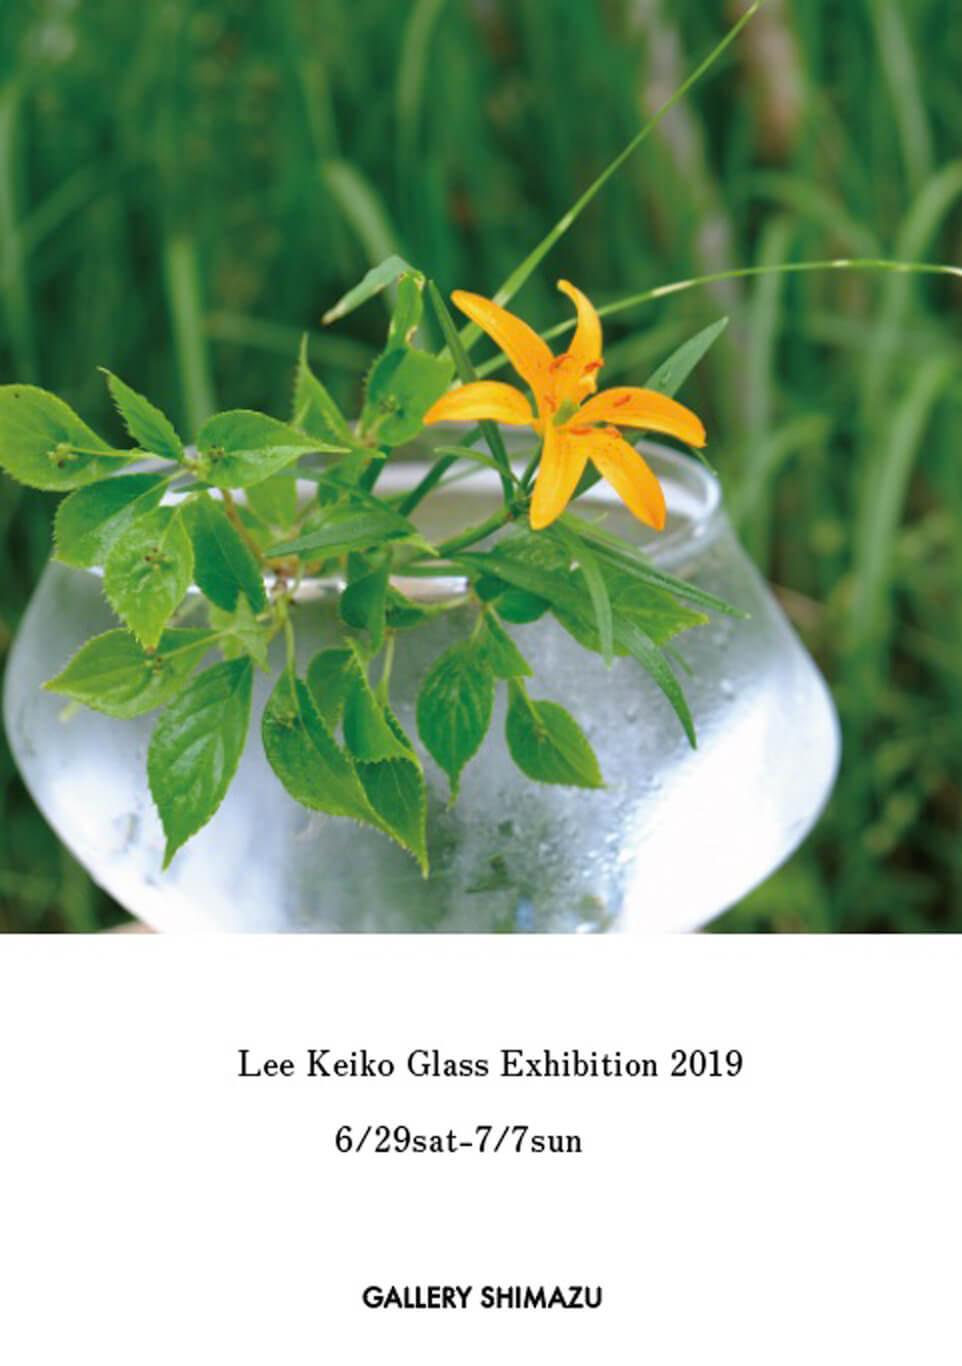 shimazu-201906-李慶子-ガラス展2